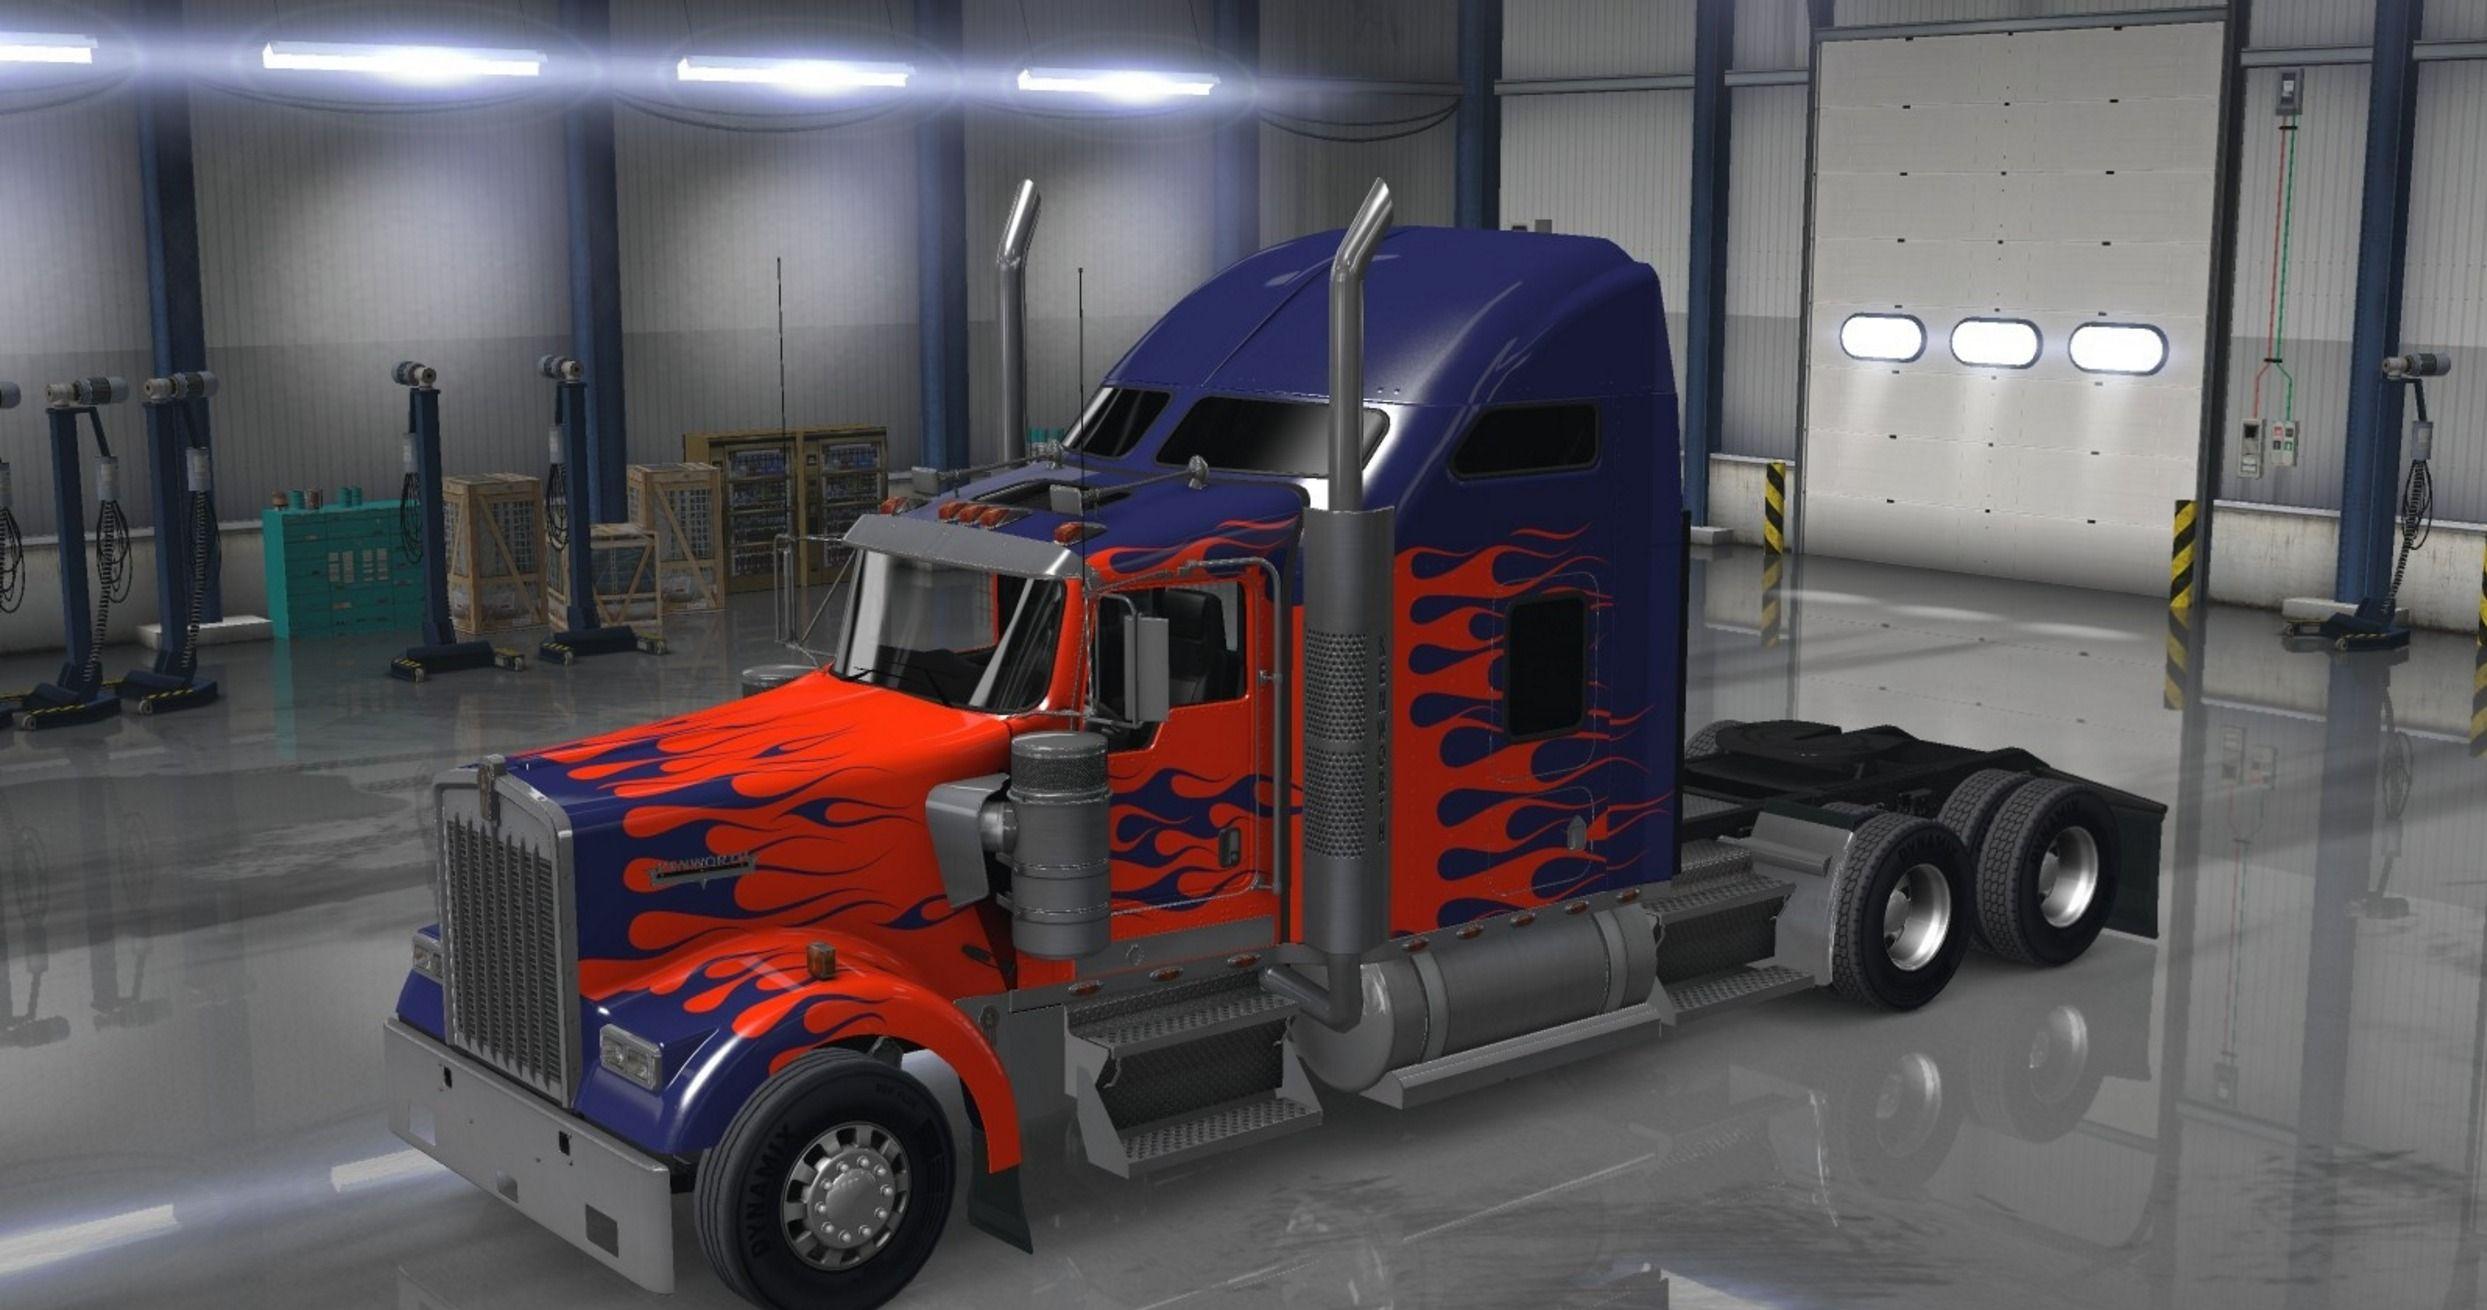 Kenworth w900 with optimus prime paint job